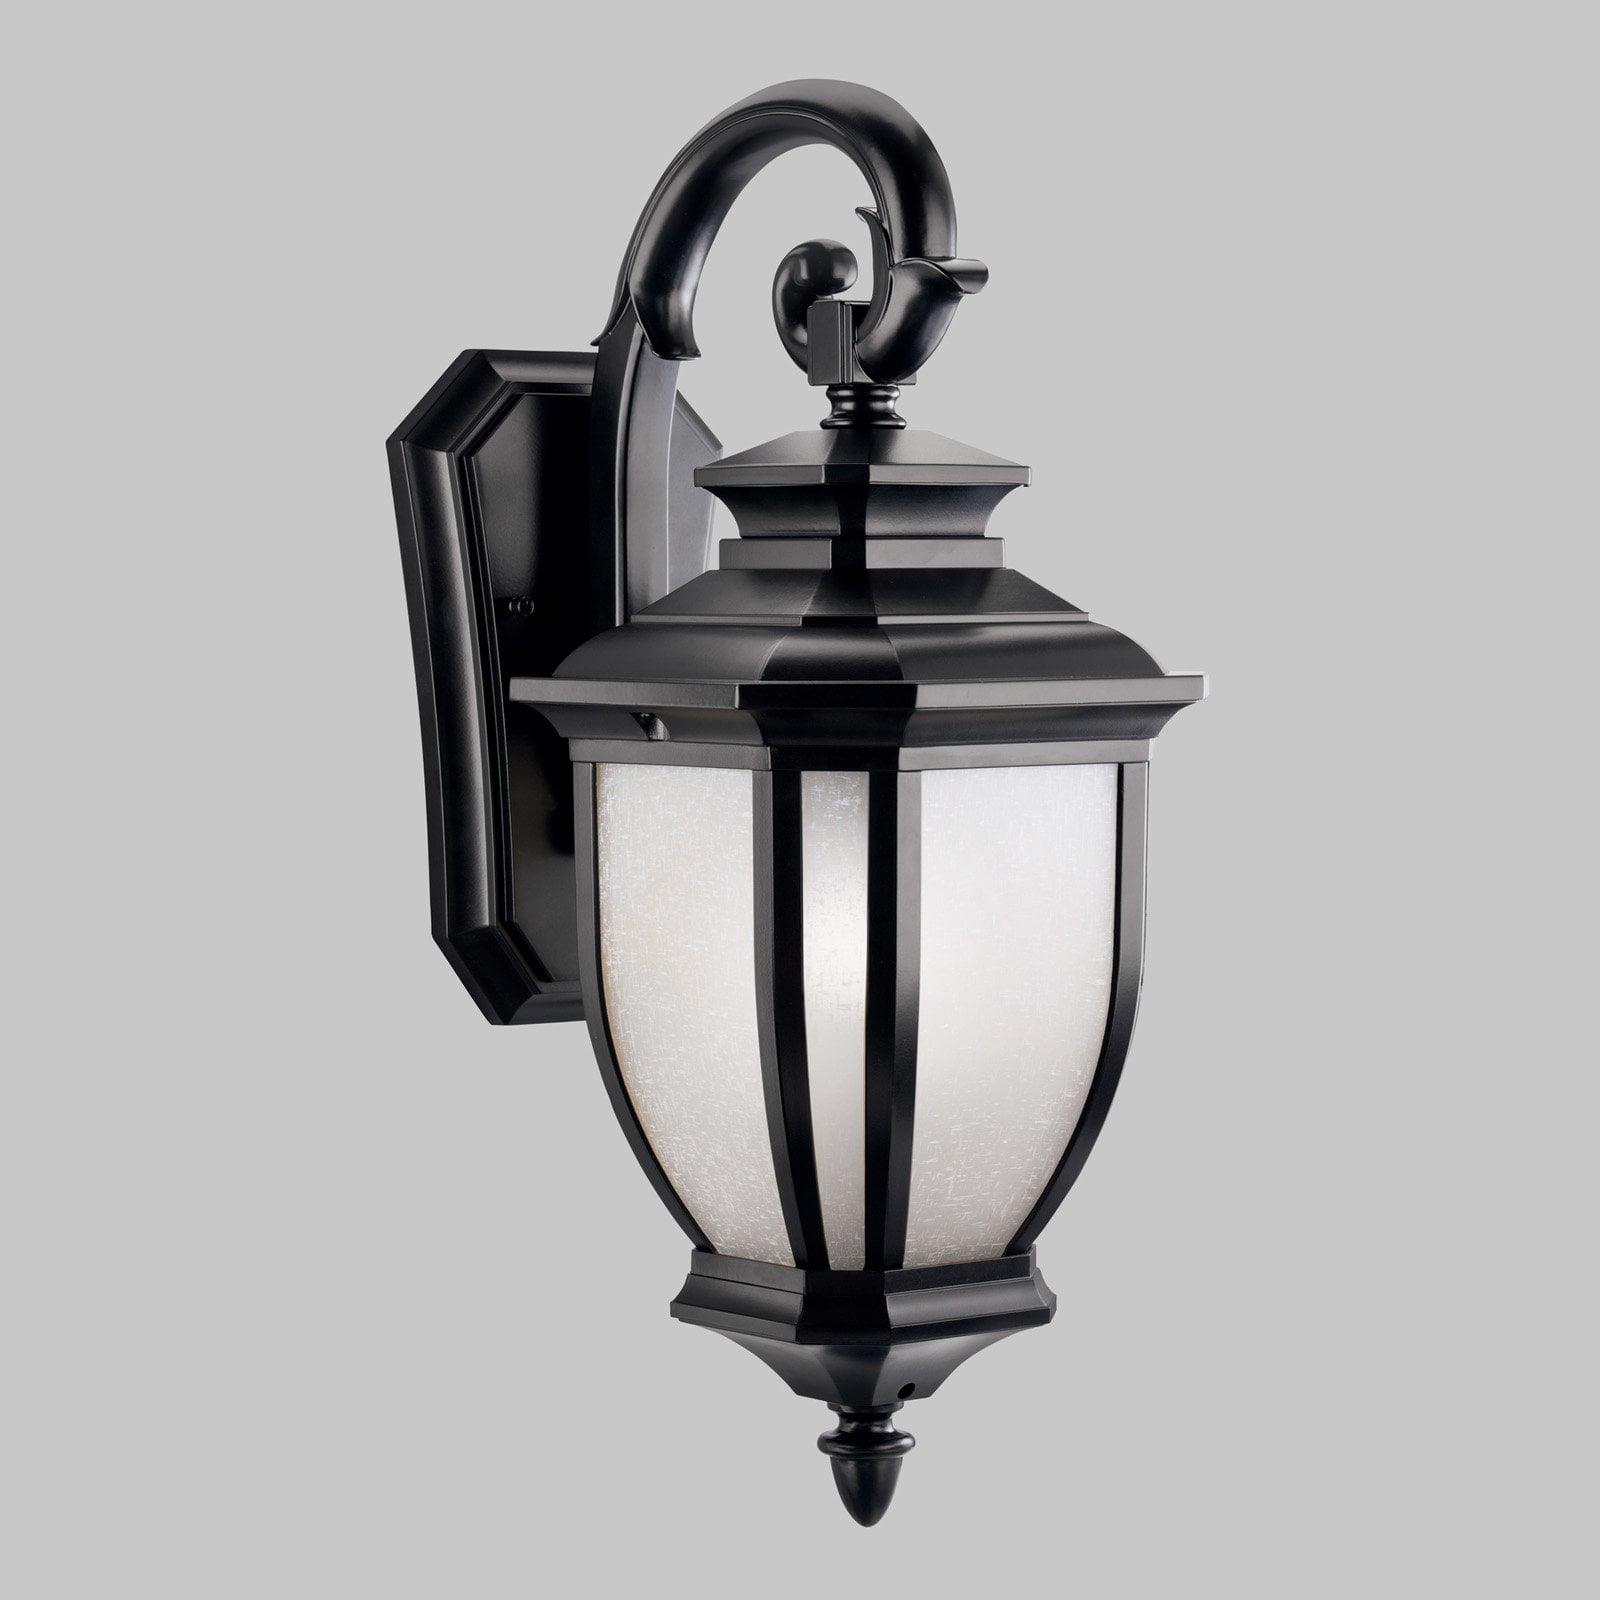 Kichler Salisbury 9040 Outdoor Wall Lantern - 8 in.